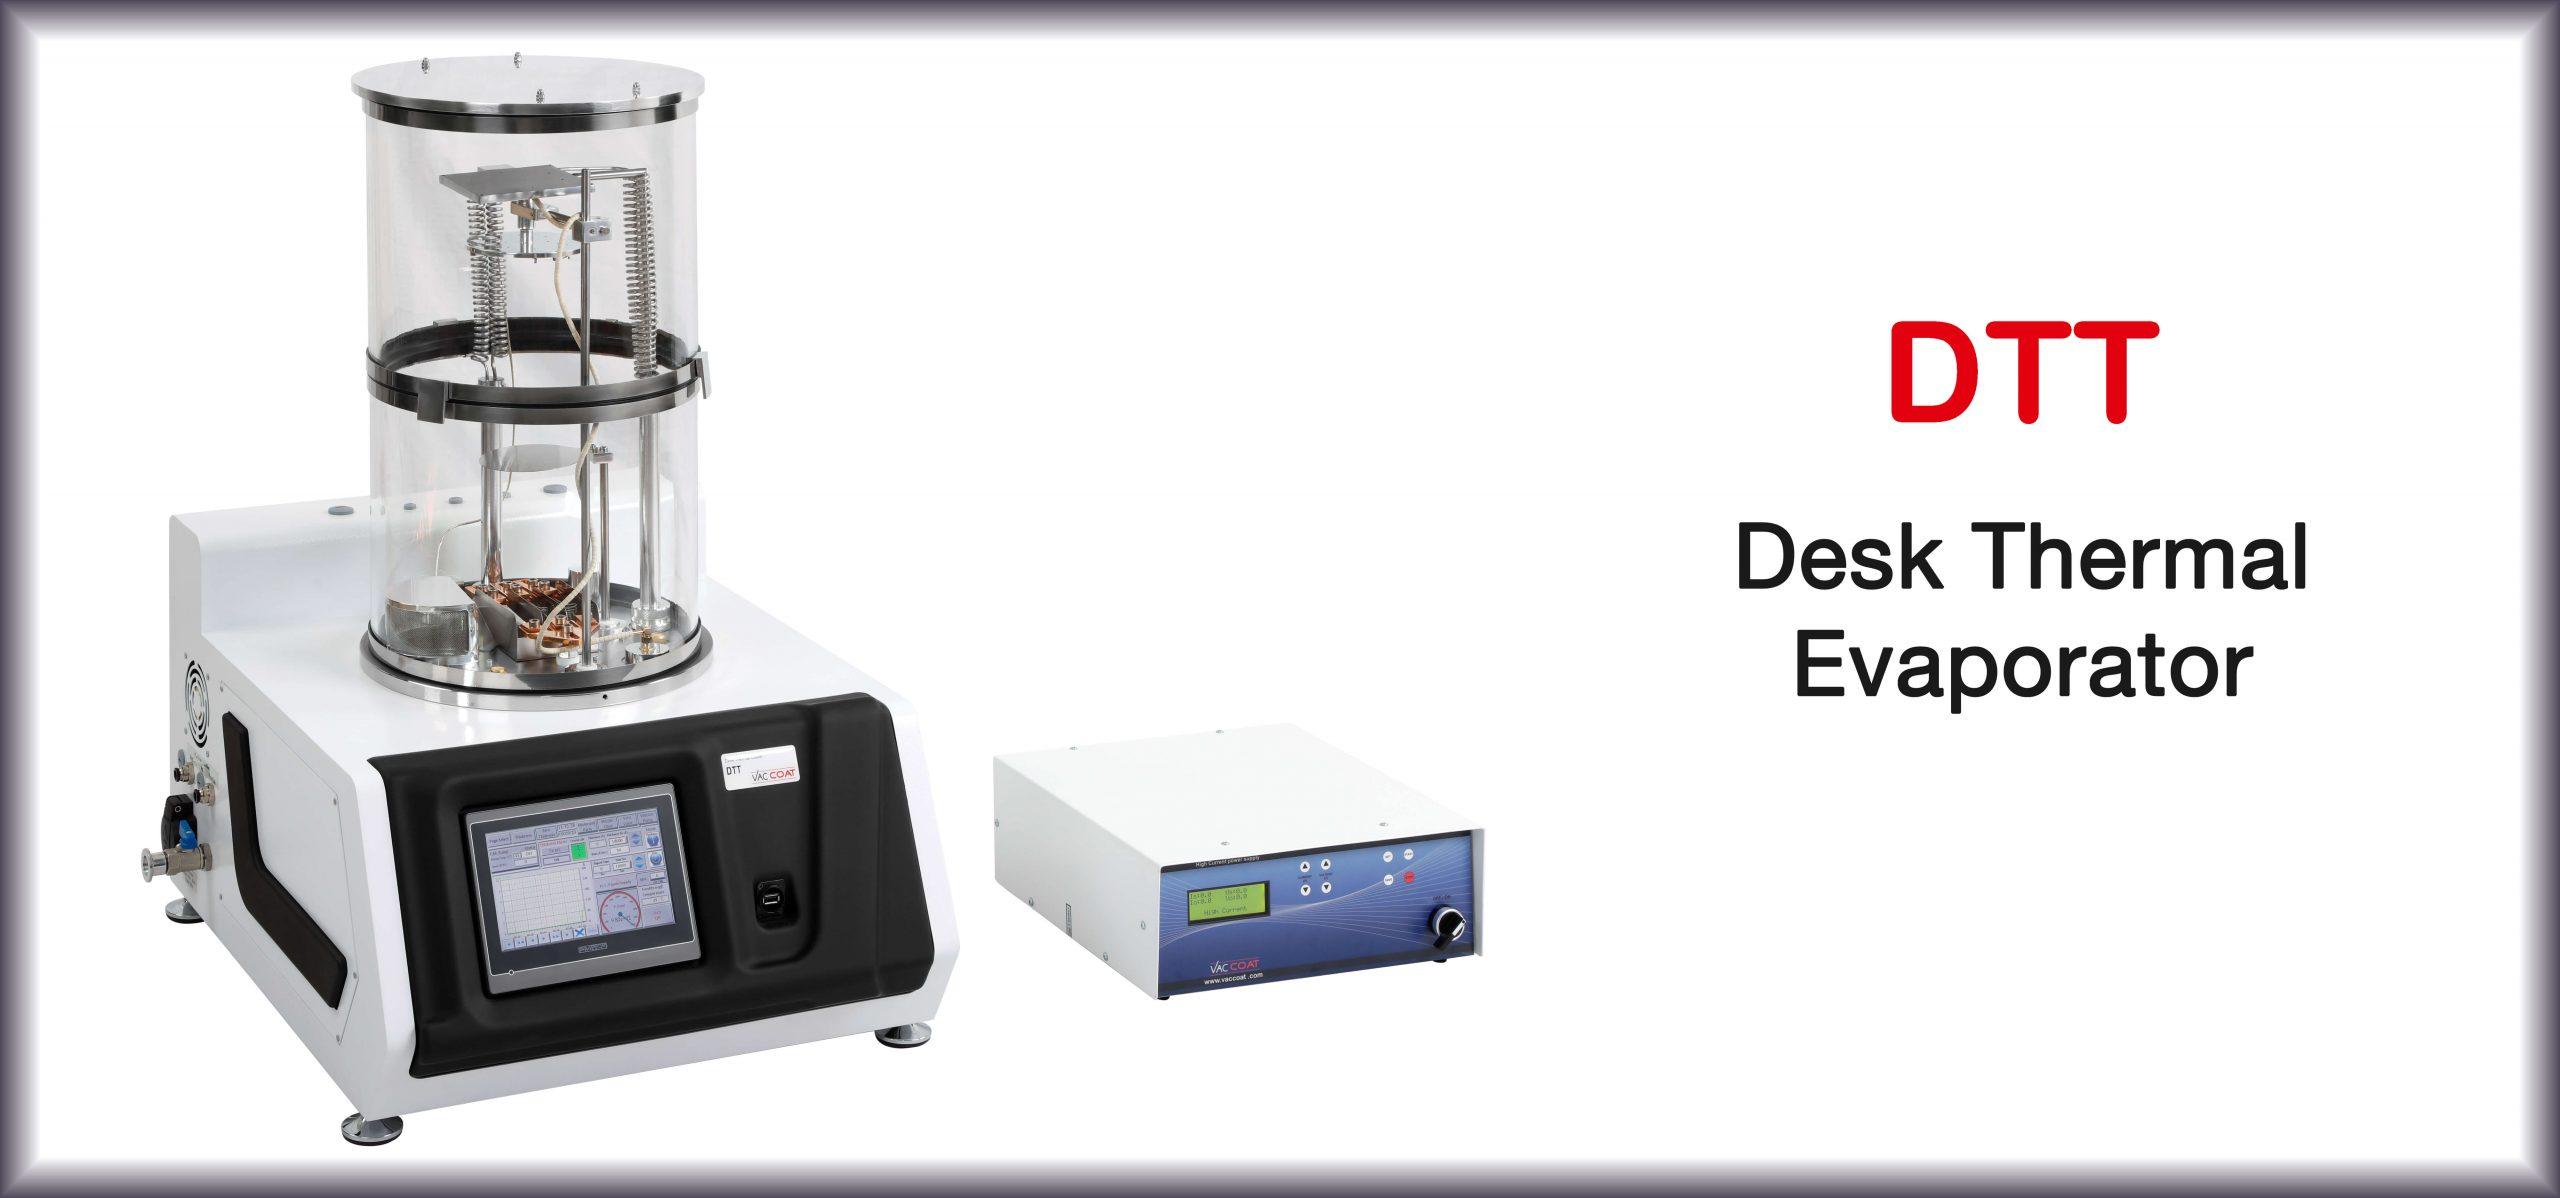 Desk Thermal Evaporator - DTT   VacCoat Product